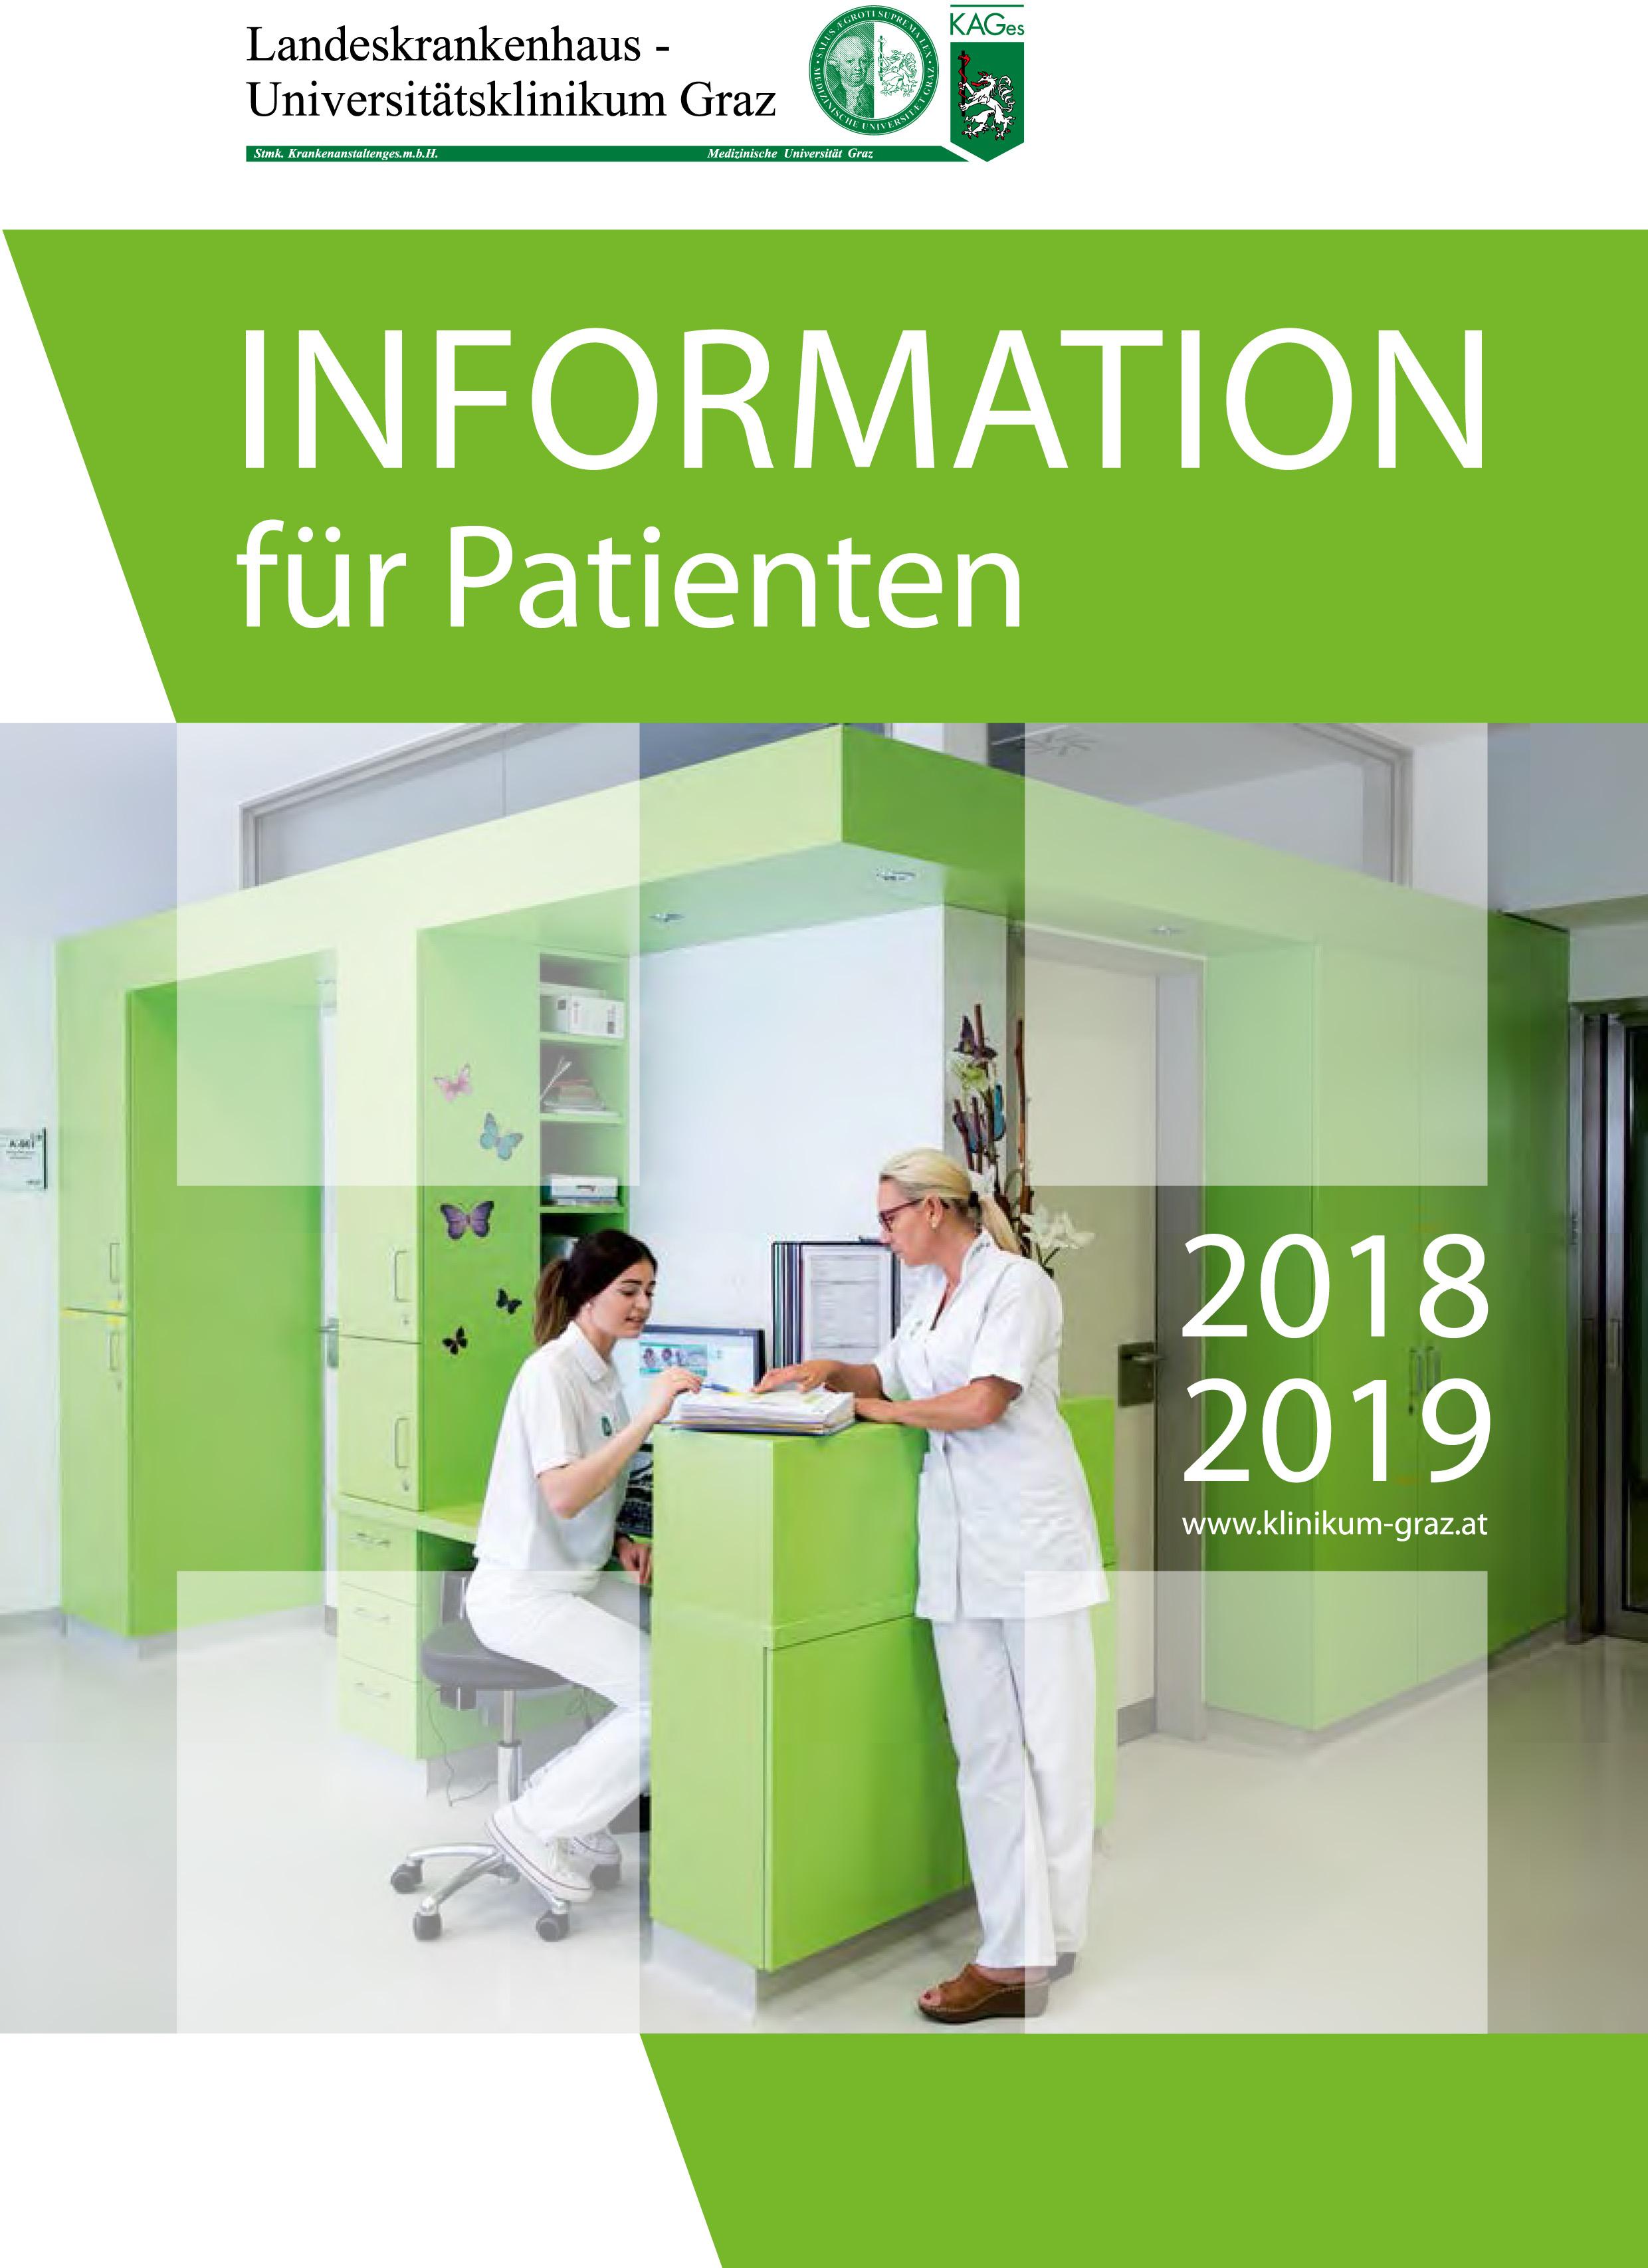 Patienteninfo_2017 LKH-Graz